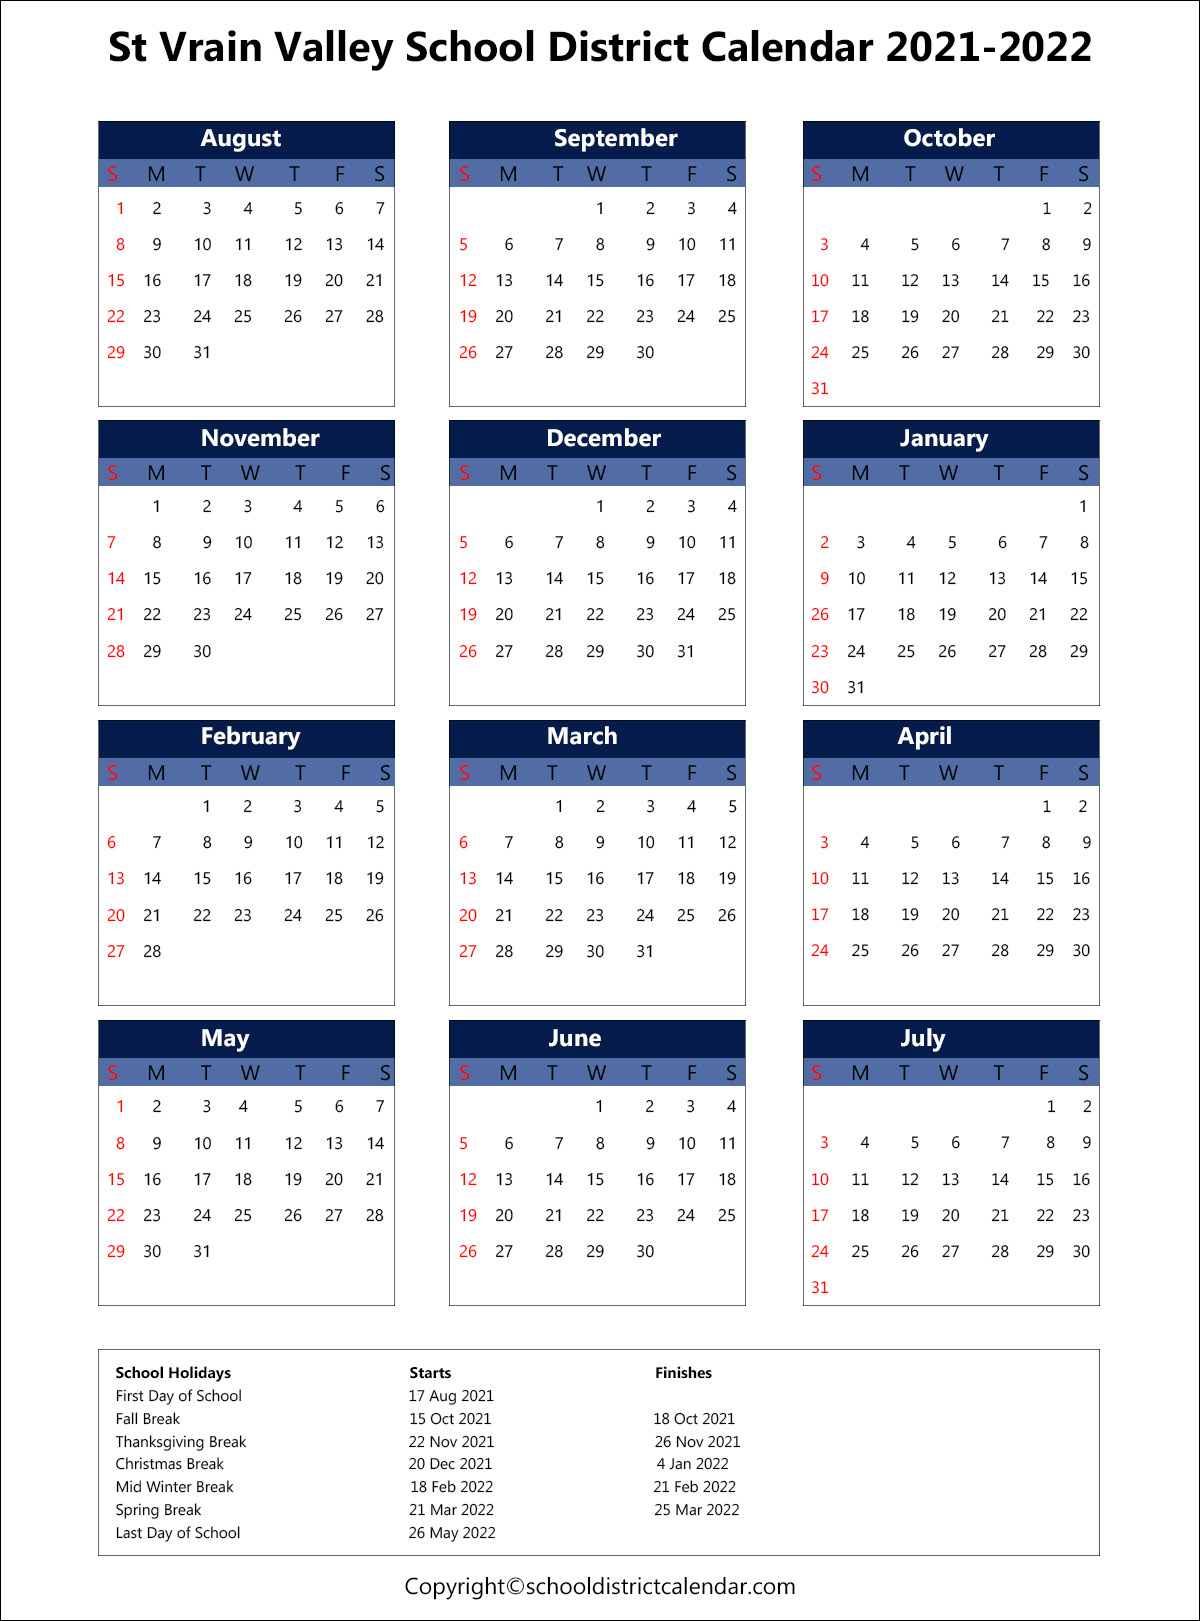 St. Vrain Valley School District Calendar 2021